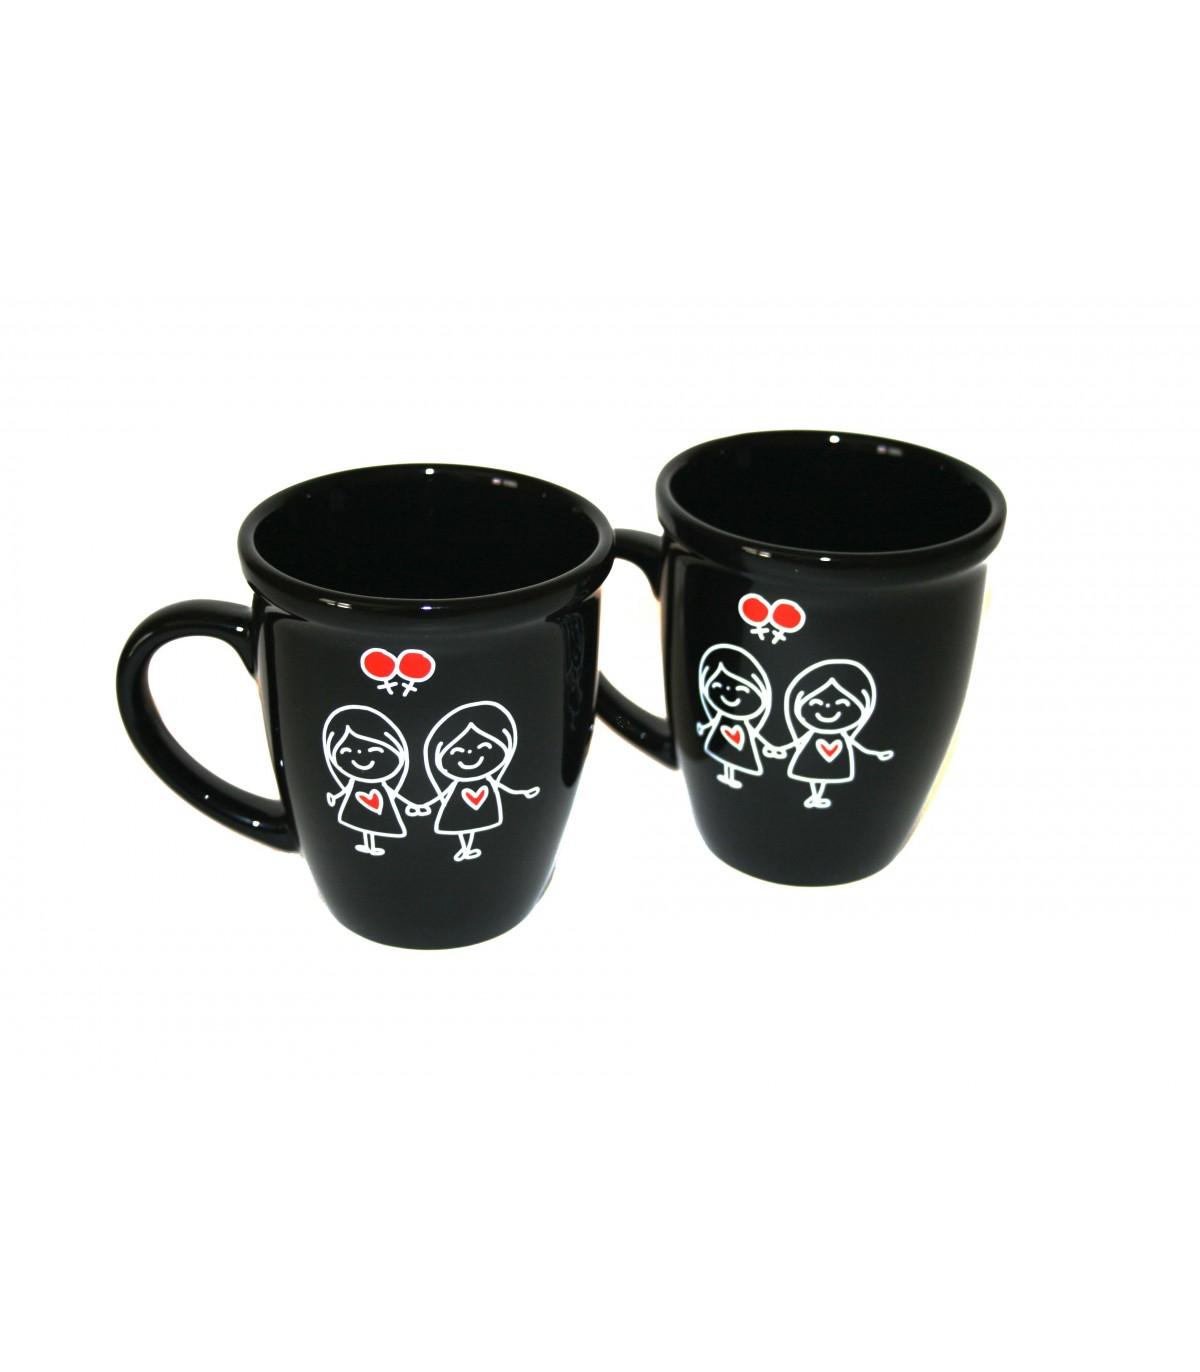 Set Of 2 Girls Holding Hands Mugs